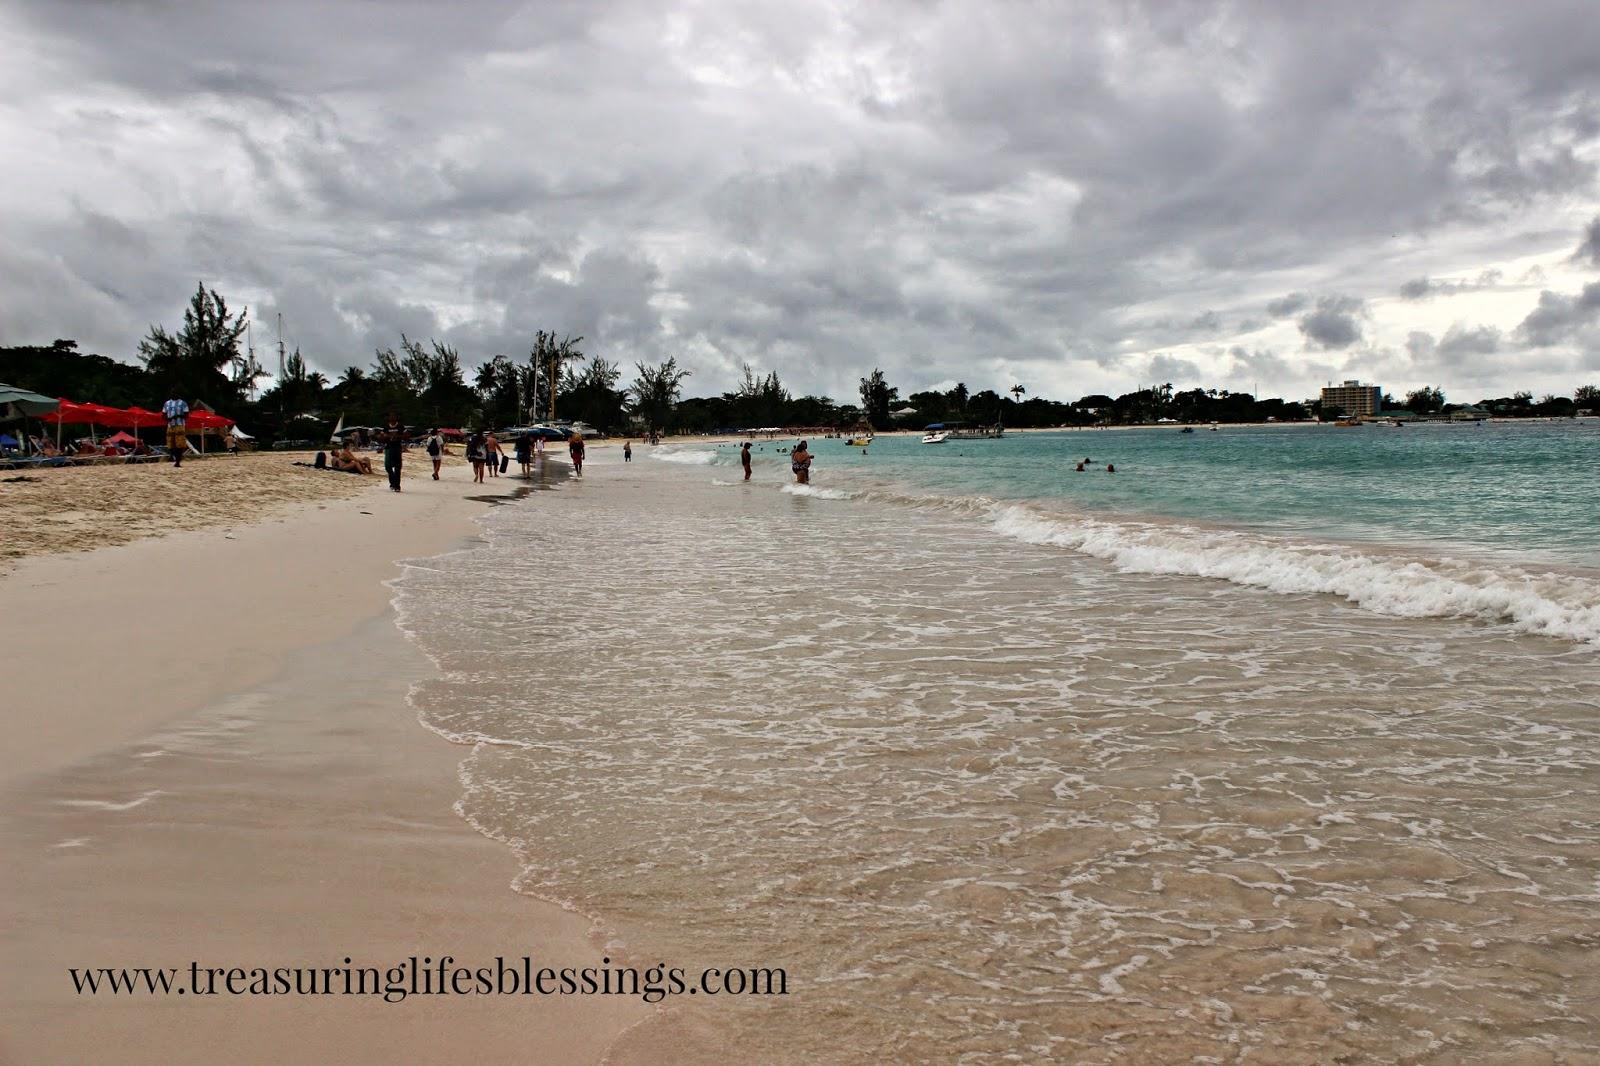 Barbados-Explorer of the Seas